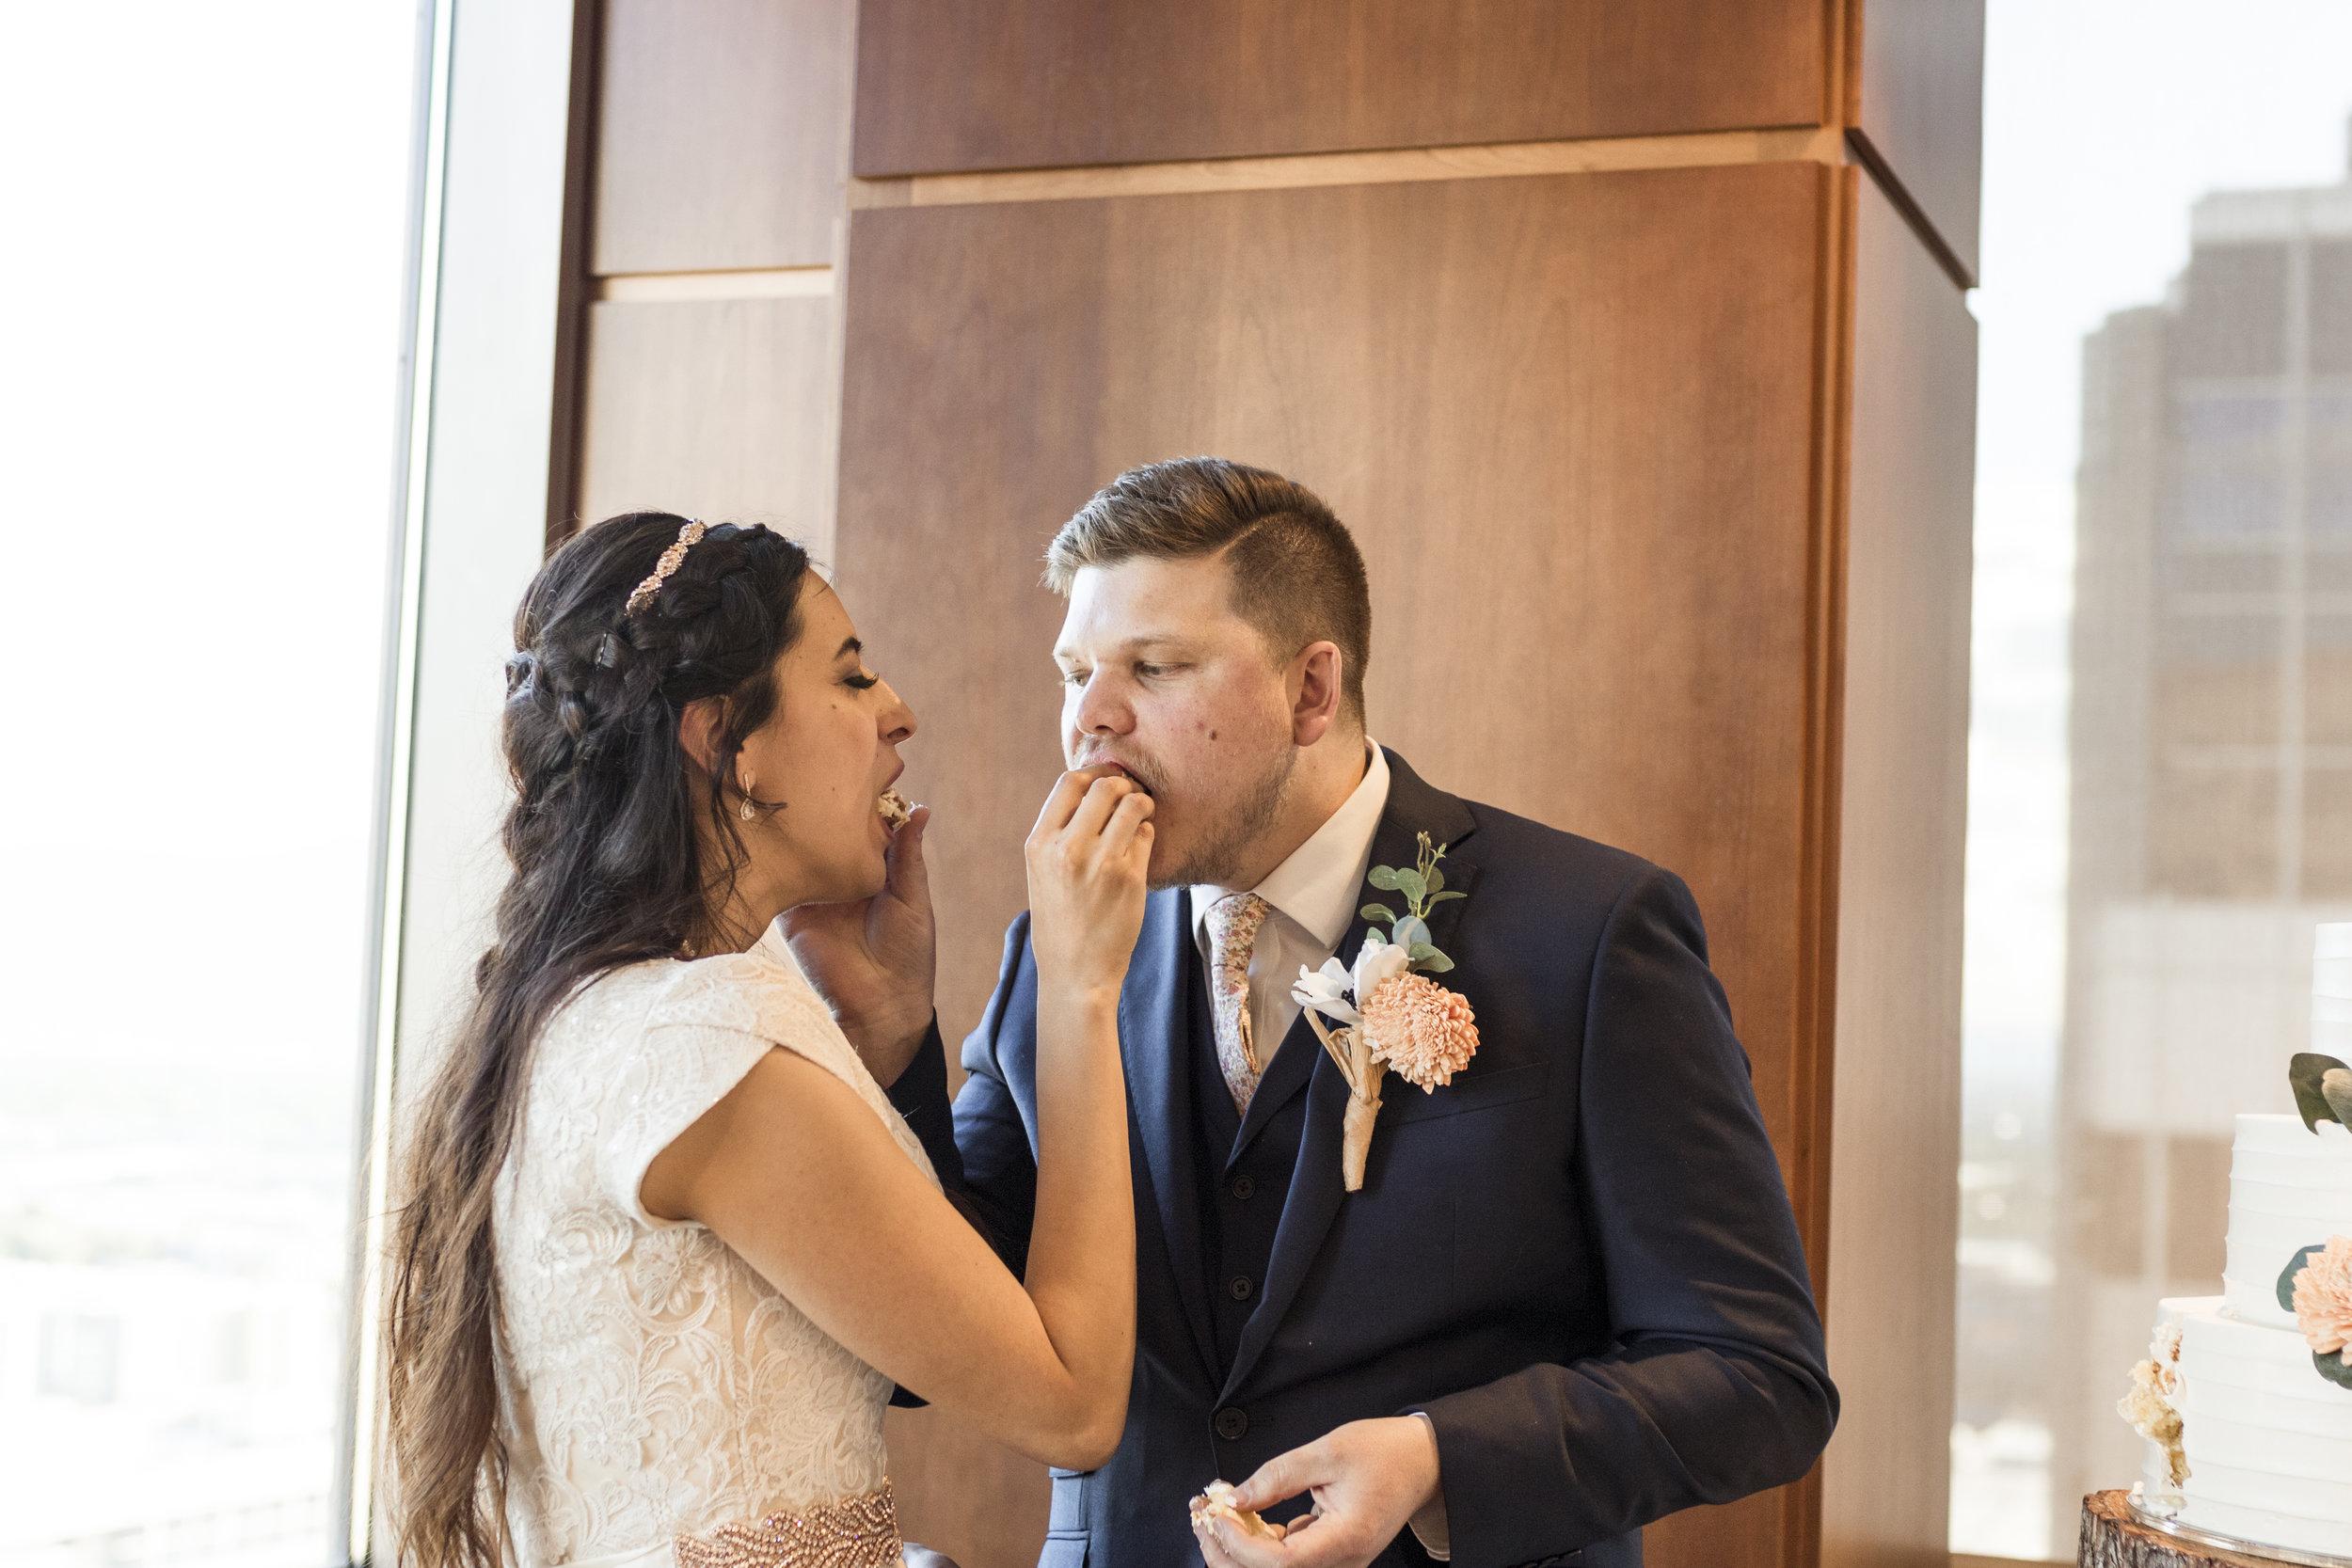 Utah Spring Wedding Reception in the Zions Bank Founders Room by Bri Bergman Photography15.JPG